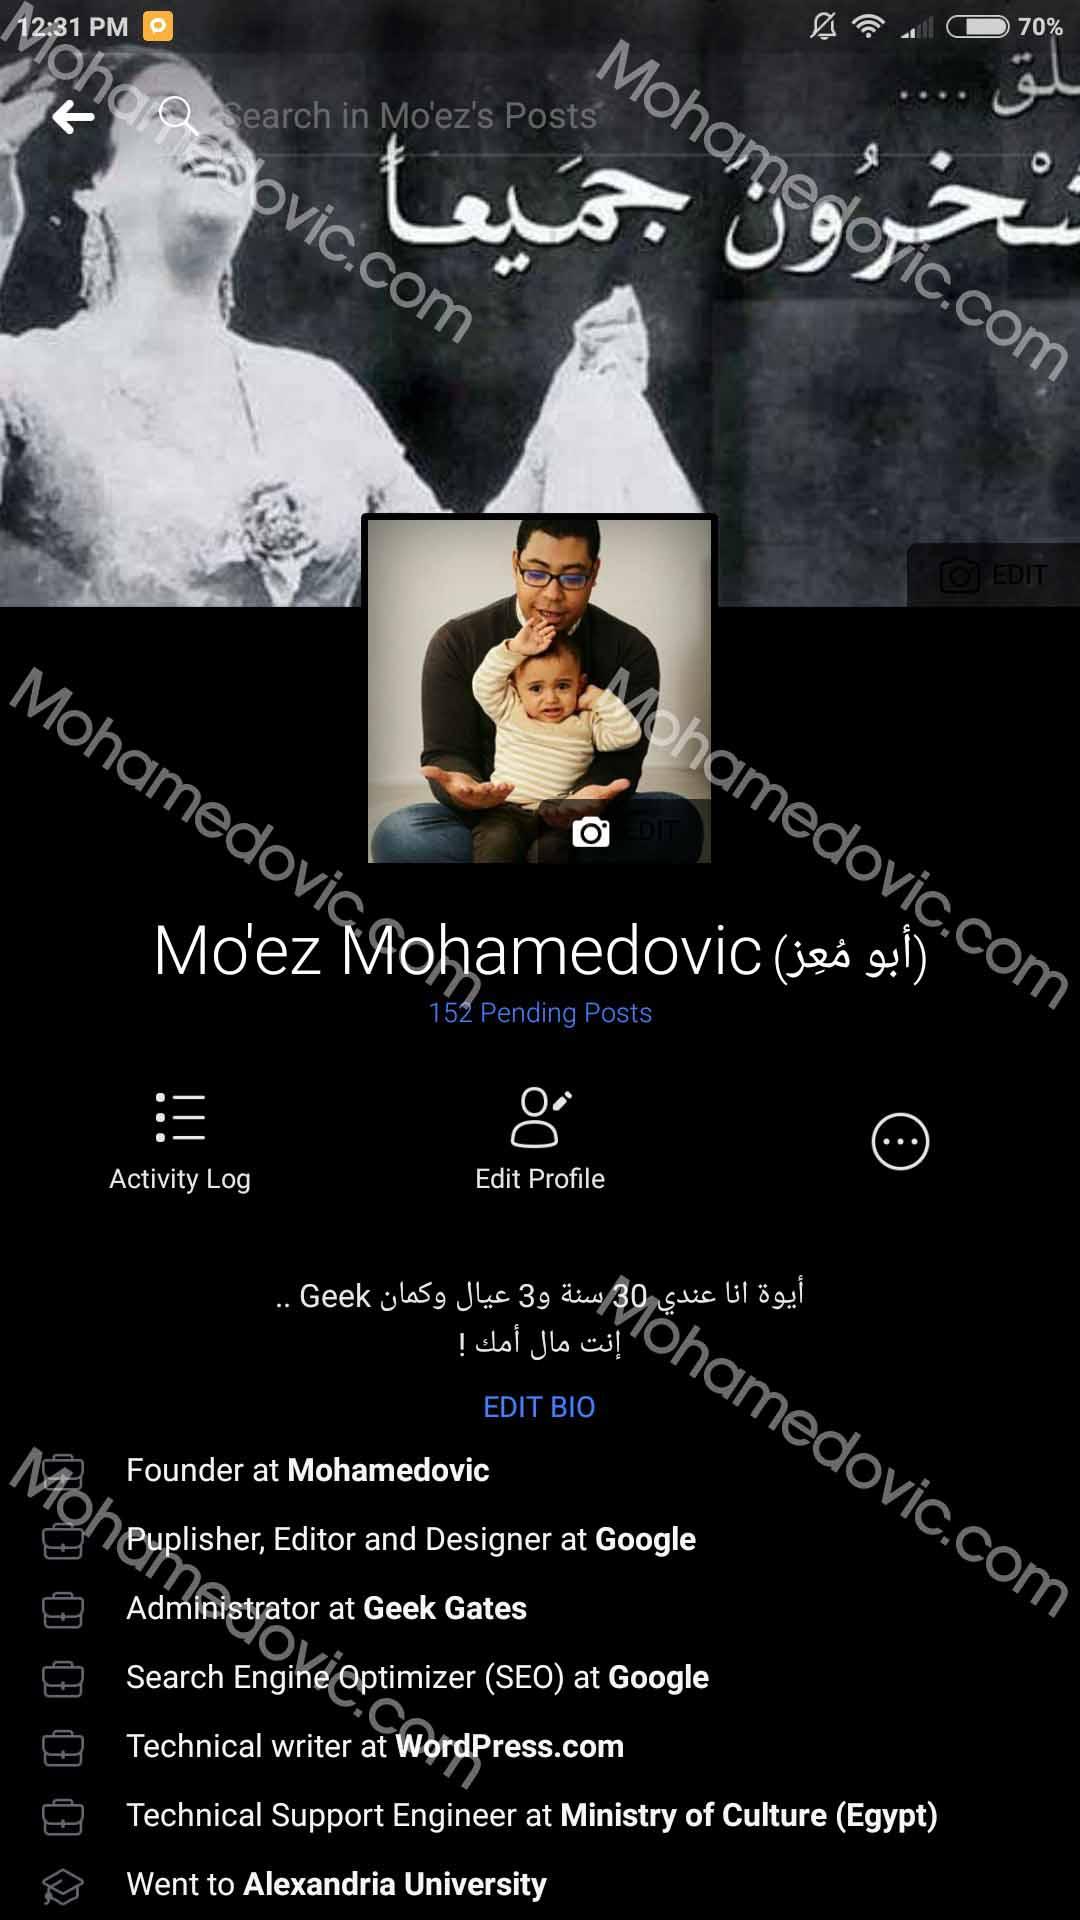 تحميل فيس بوك اسود 2020 Dark Mode ماسنجر الاسود Apk رسمي